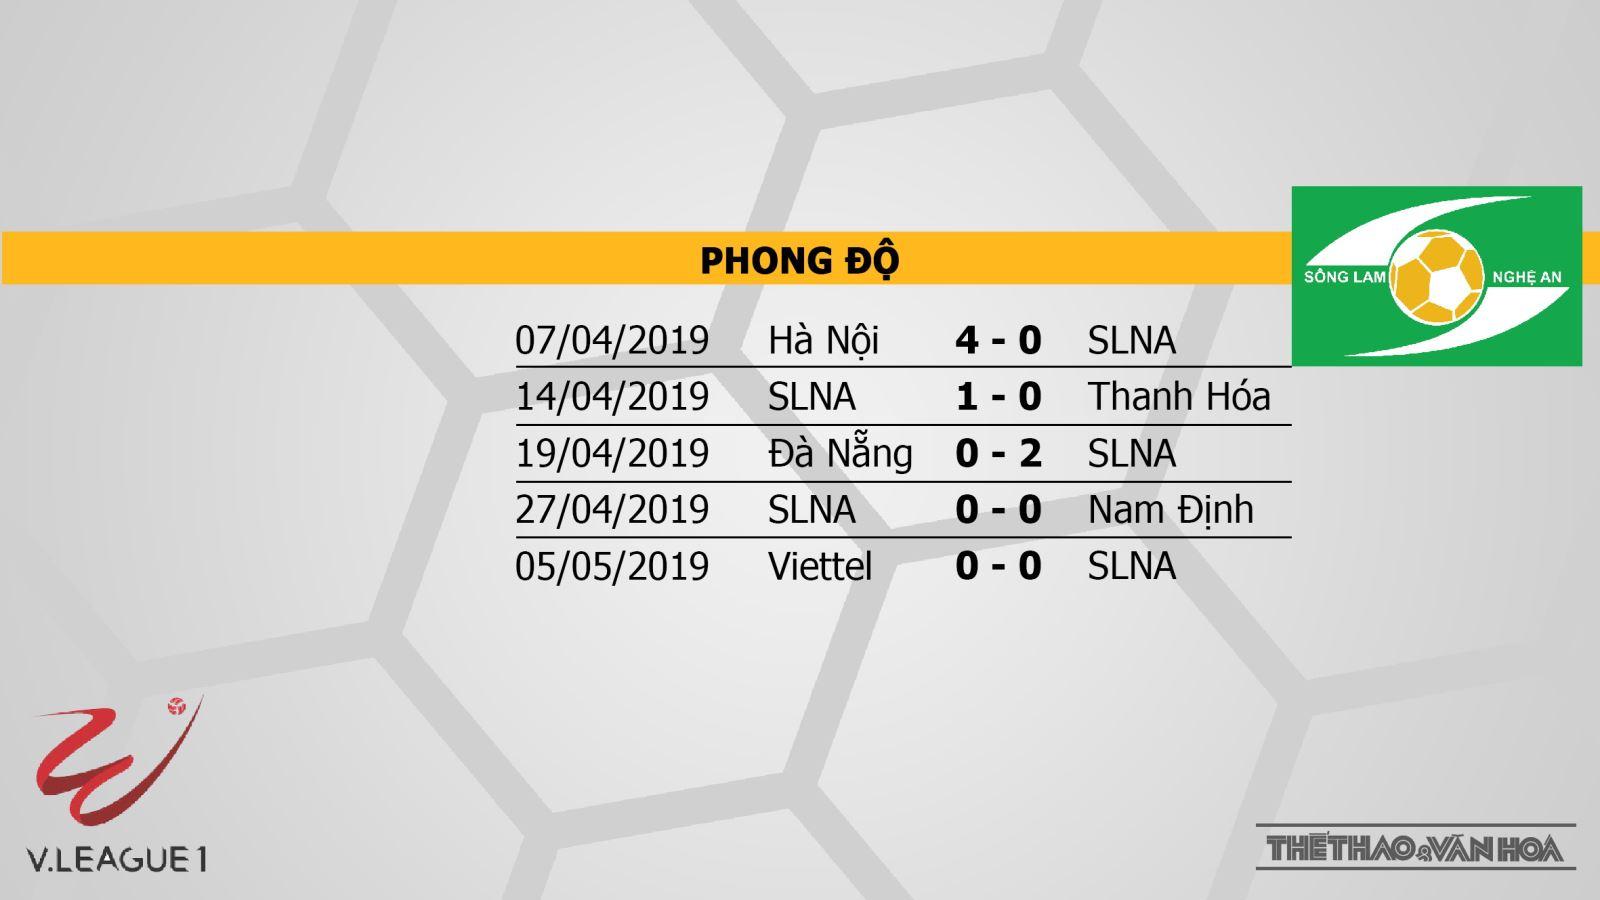 Hải Phòng vs SLNA, SLNA, Hải Phòng, truc tiep bong da, trực tiếp bóng đá, truc tiep Hai Phong, truc tiep Hai Phong vs SLNA, v league 2019, truc tiep v league, BDTV, FPT Play